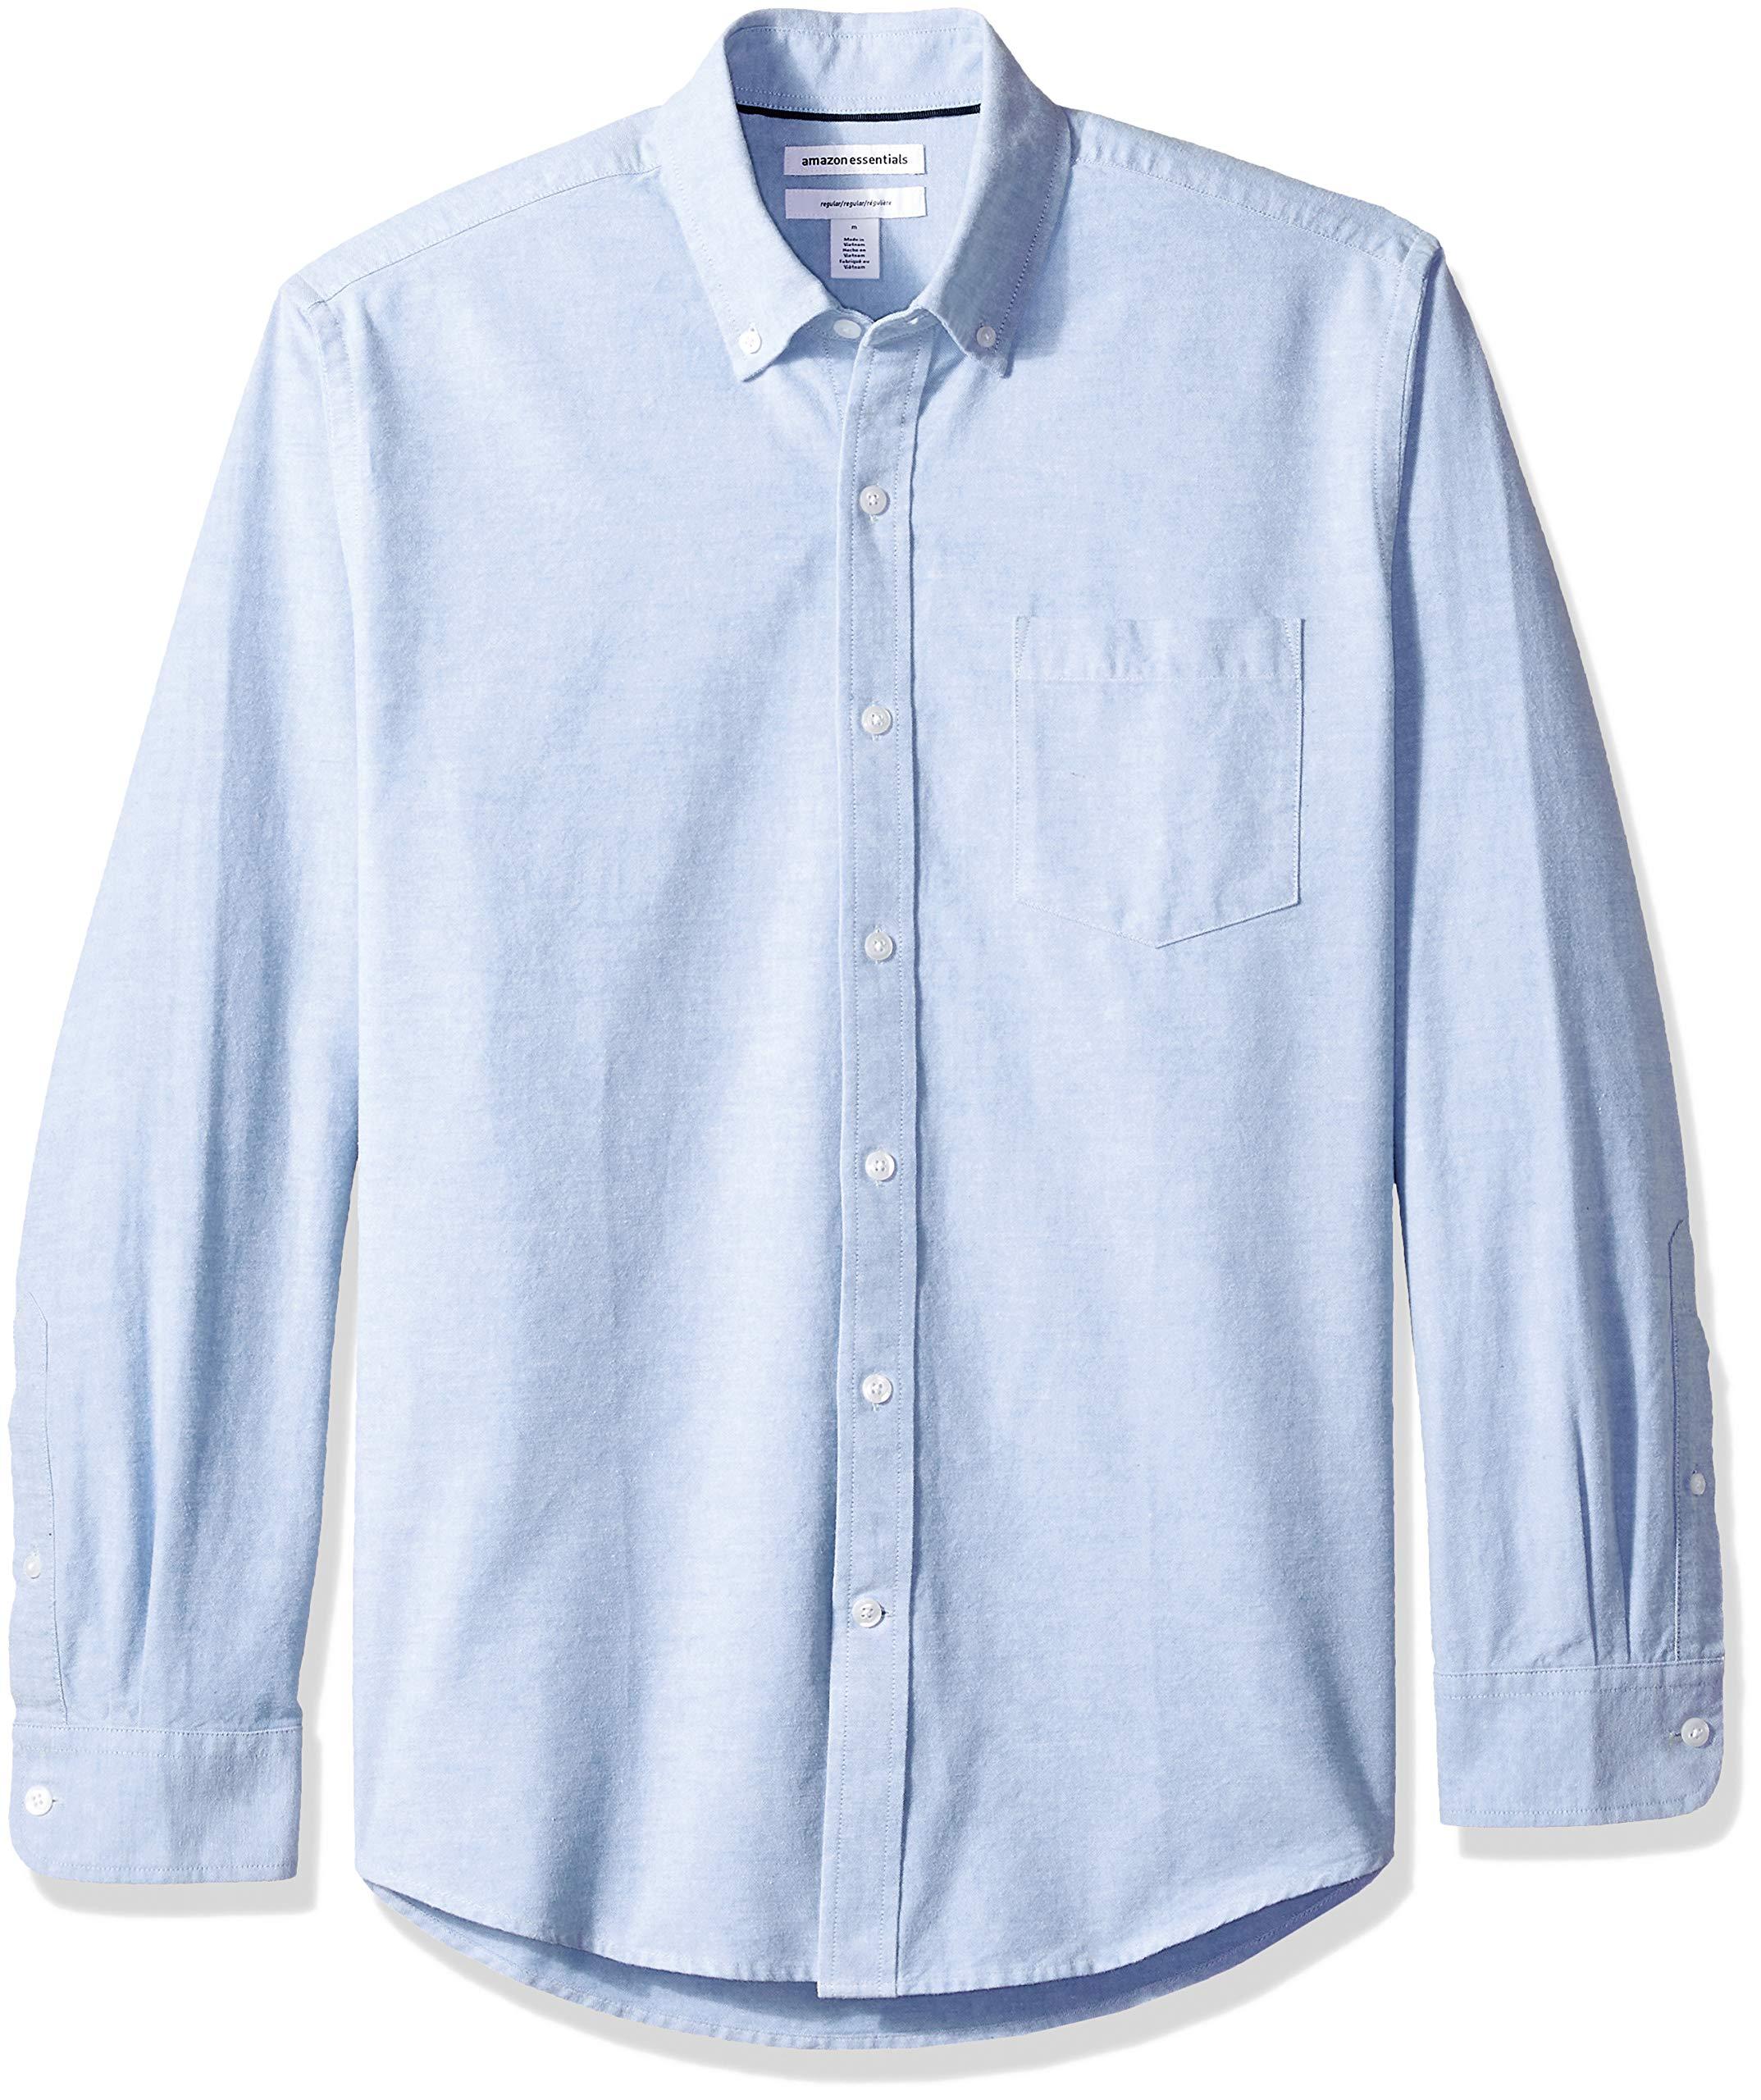 Essentials Regular-Fit Long-Sleeve Solid Pocket Oxford